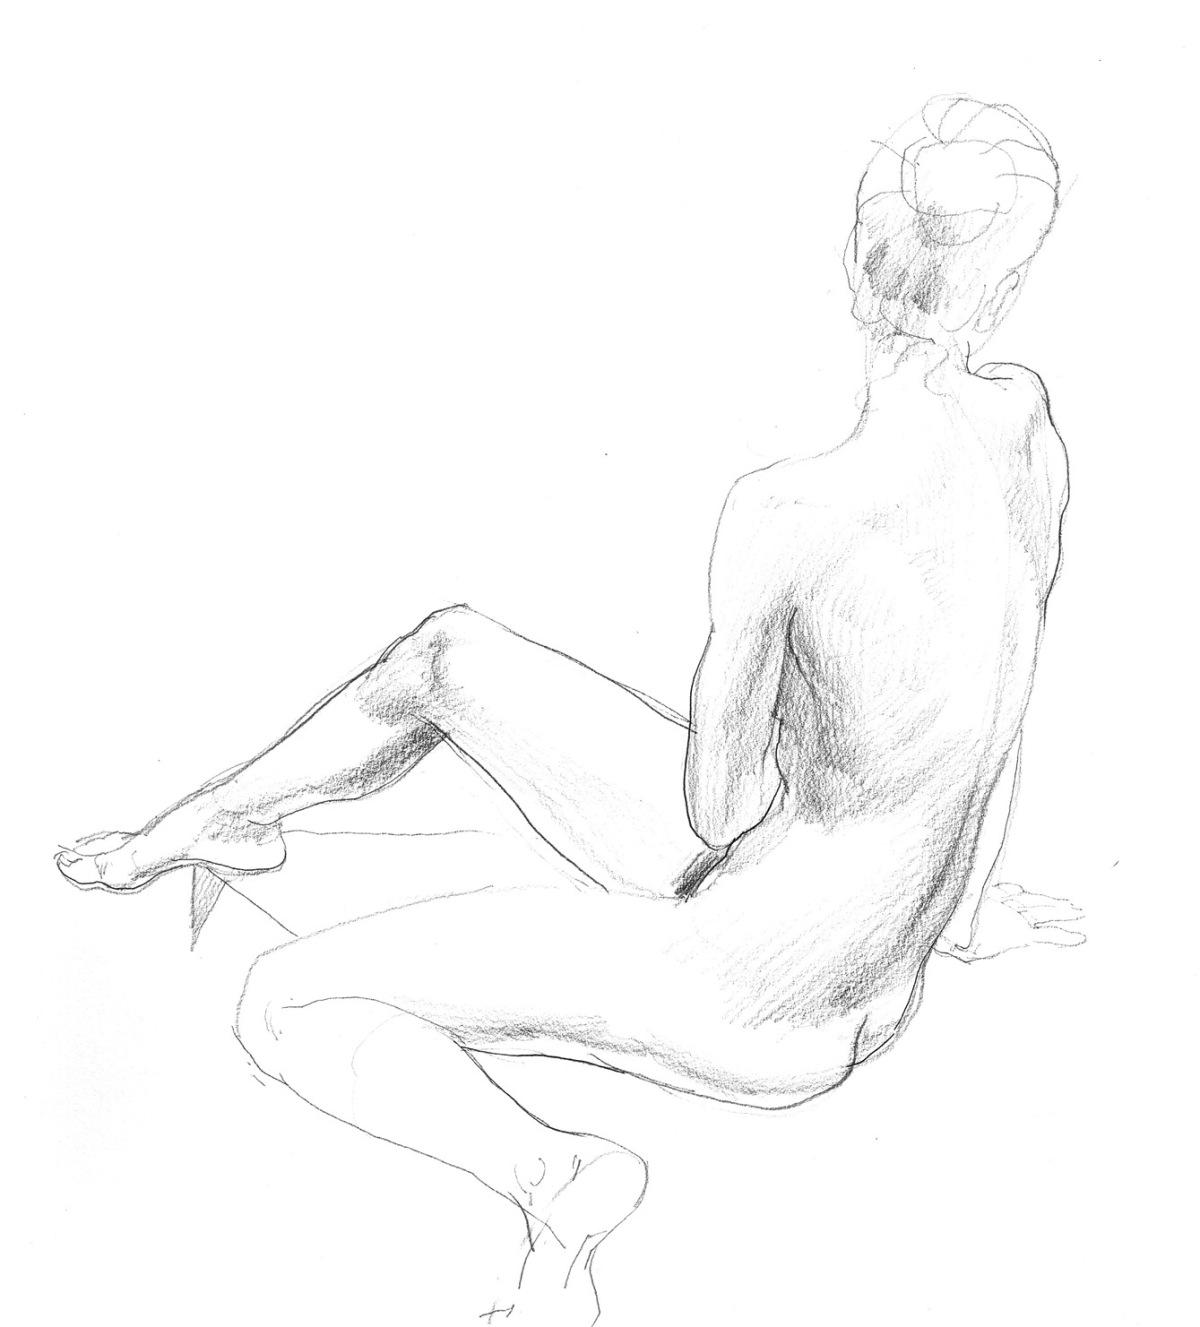 scott breton pencil 2a 1.jpg